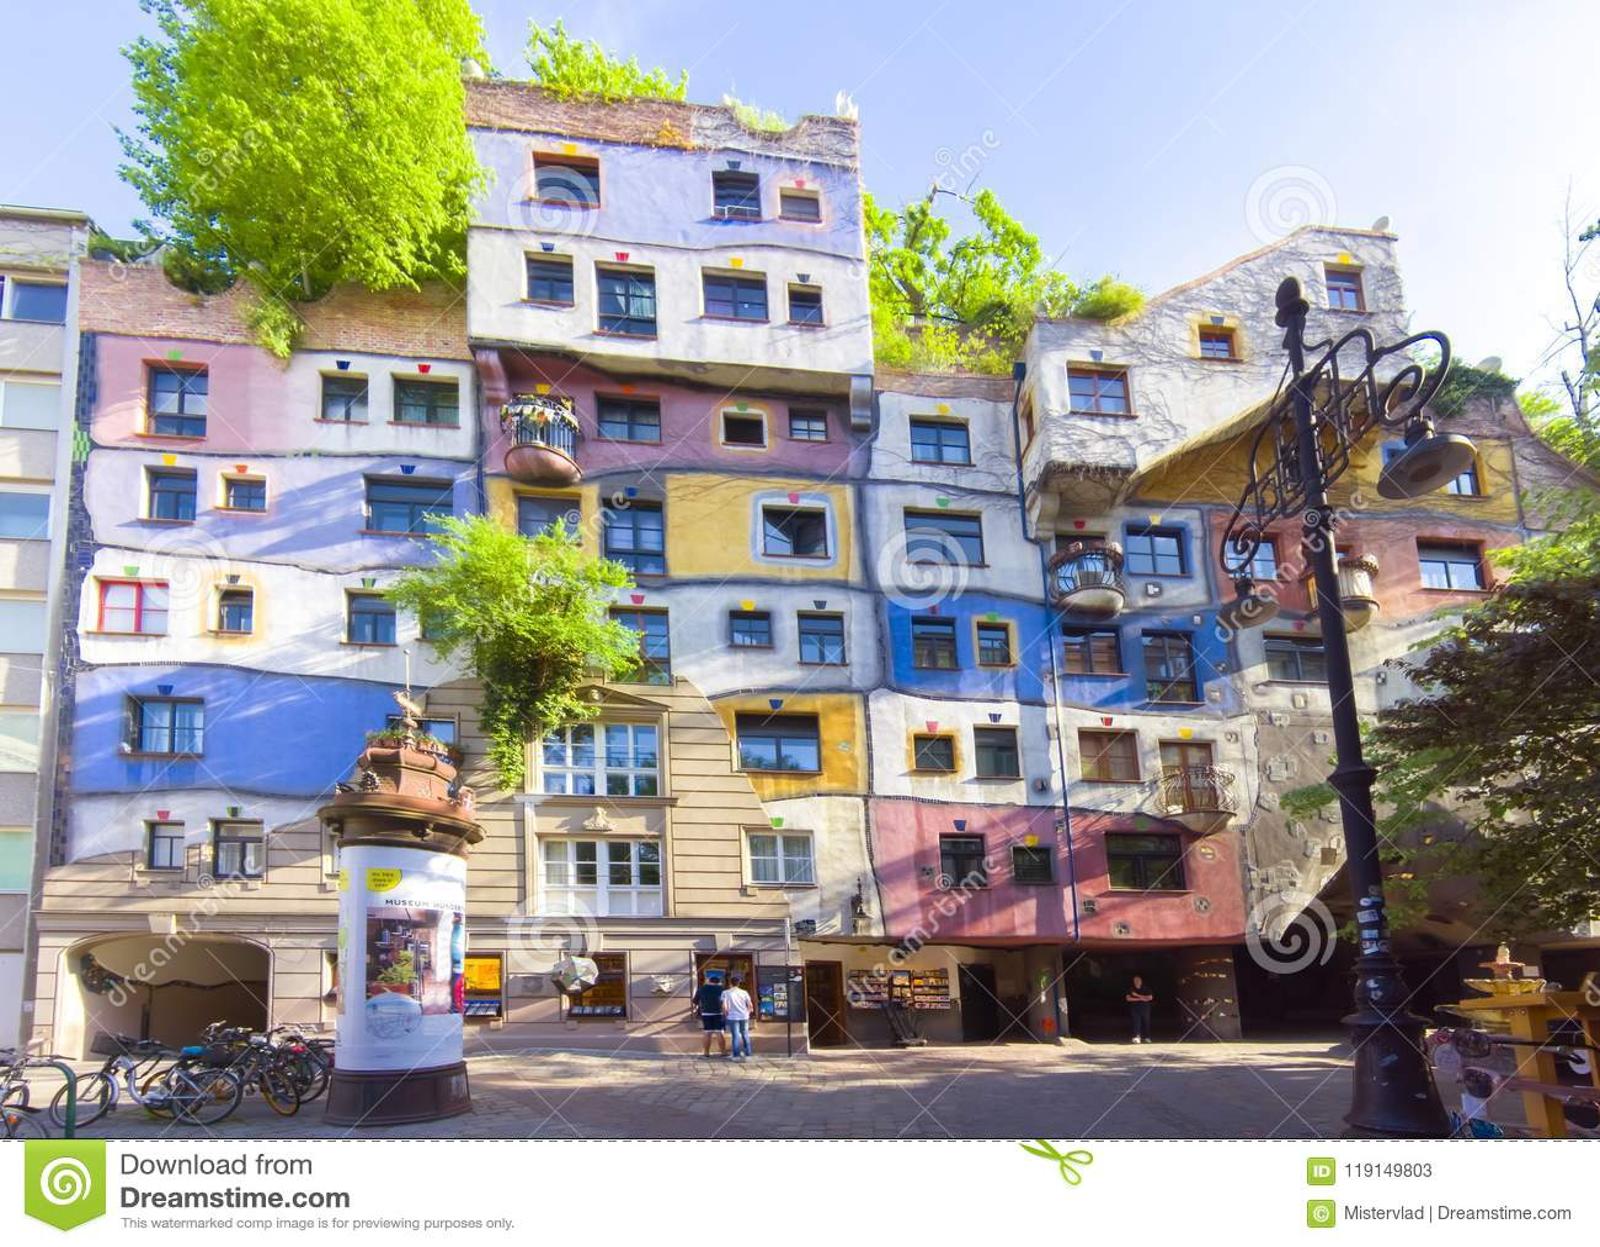 Hundertwasser House In Vienna, Austria Editorial Stock Photo - Image of green, hundertwasserhaus: 119149803